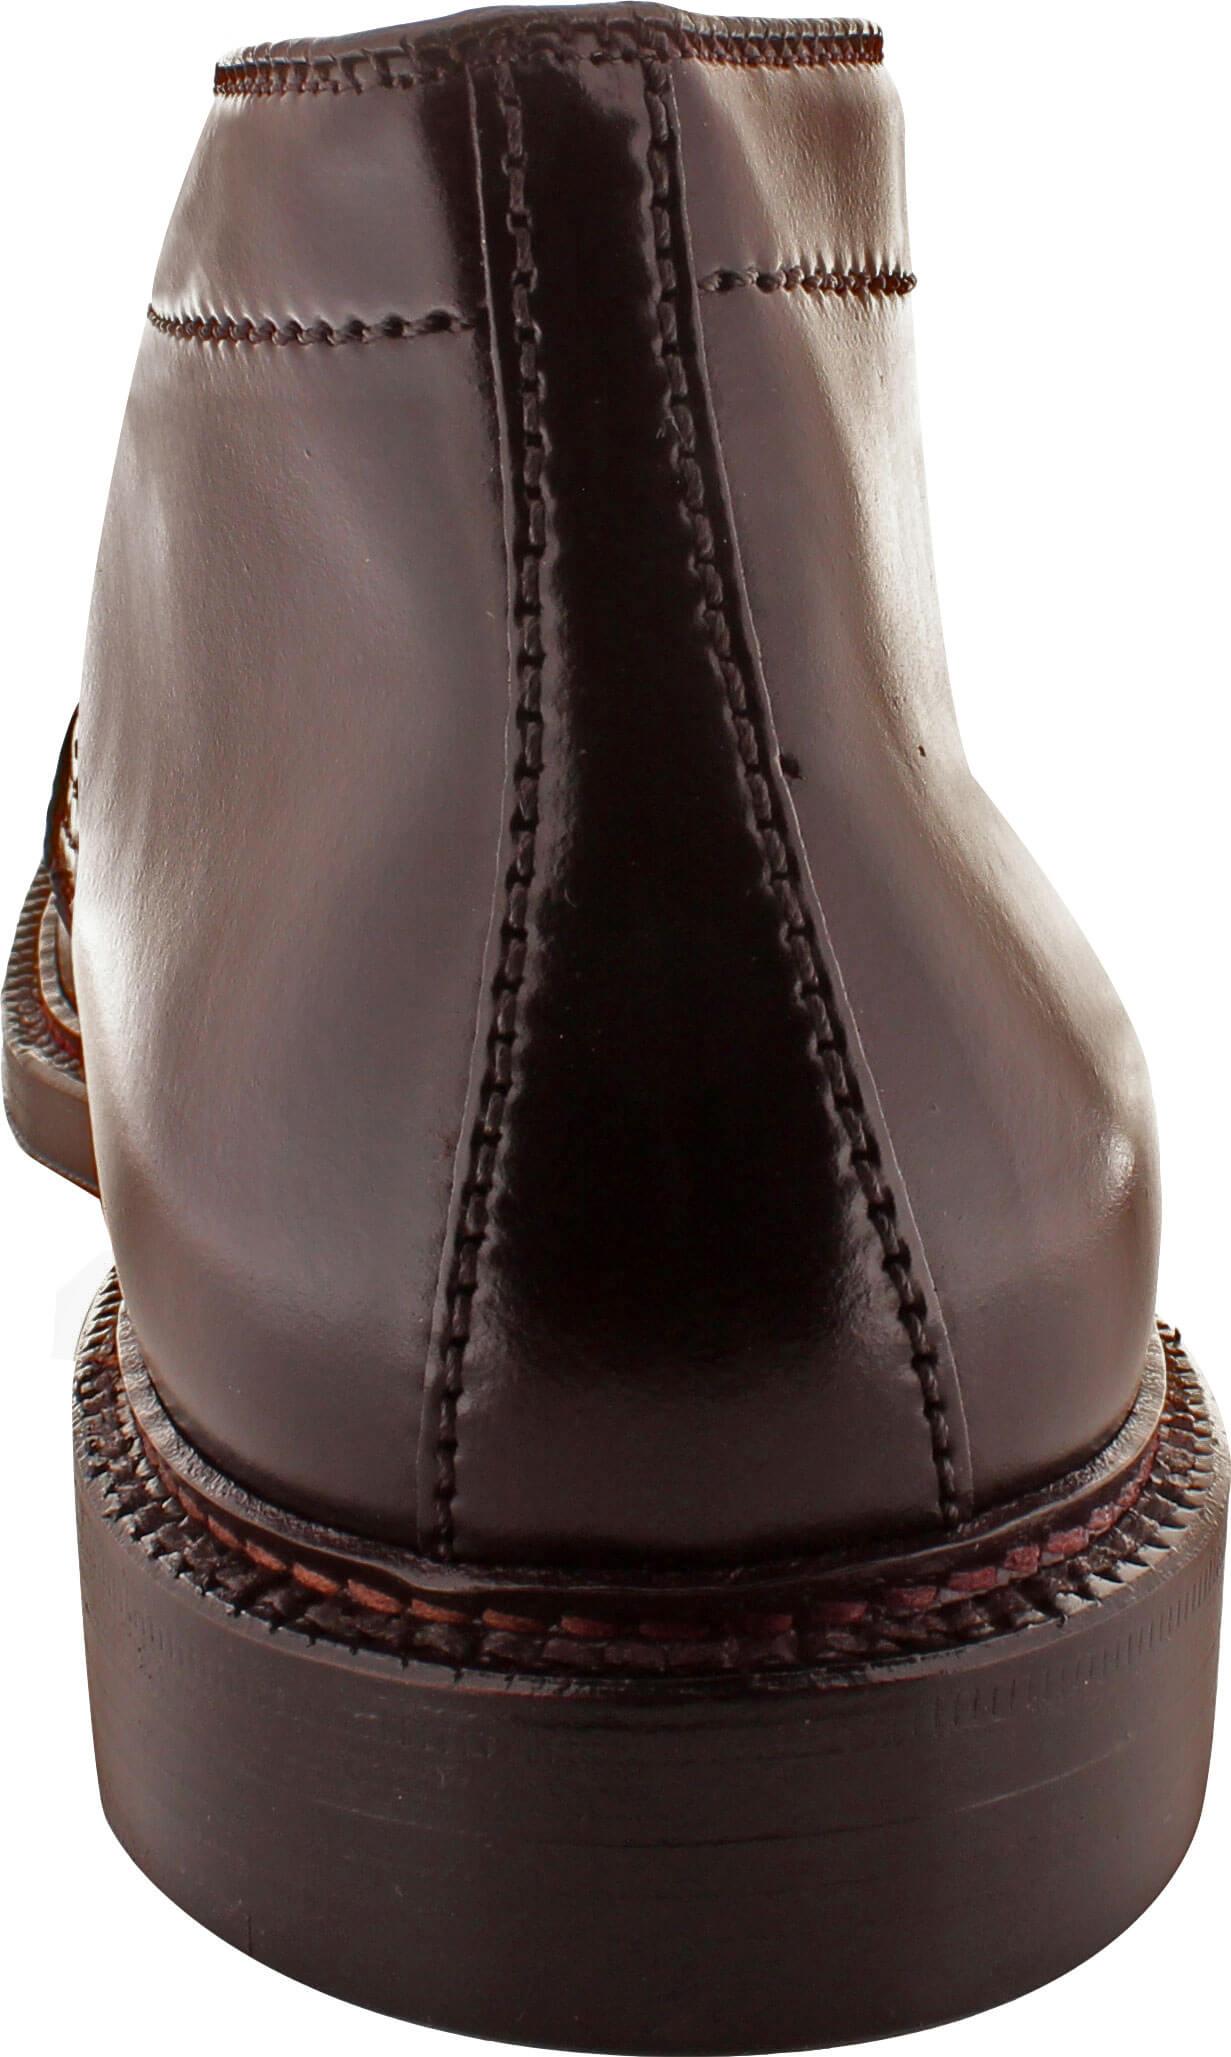 aa3d29360ef Alden Men's 1339 - Chukka Boot - Color 8 Shell Cordovan